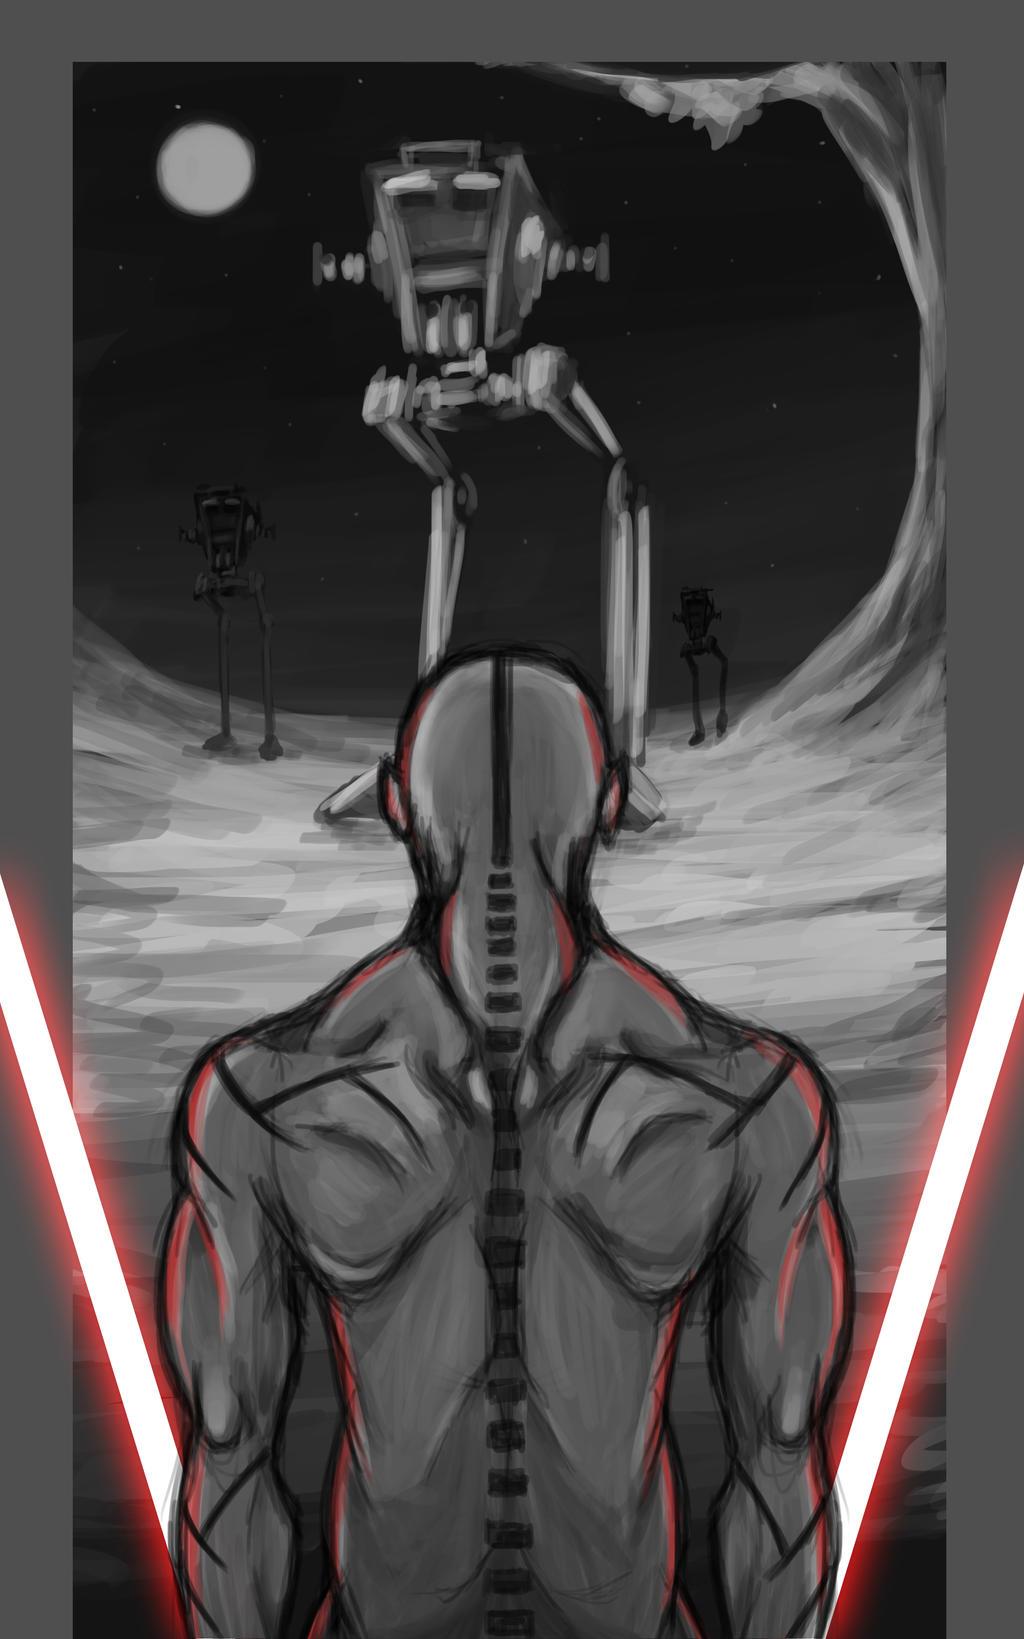 STAR WARS: Nightbrother OC (Spine) by Creative2Bit